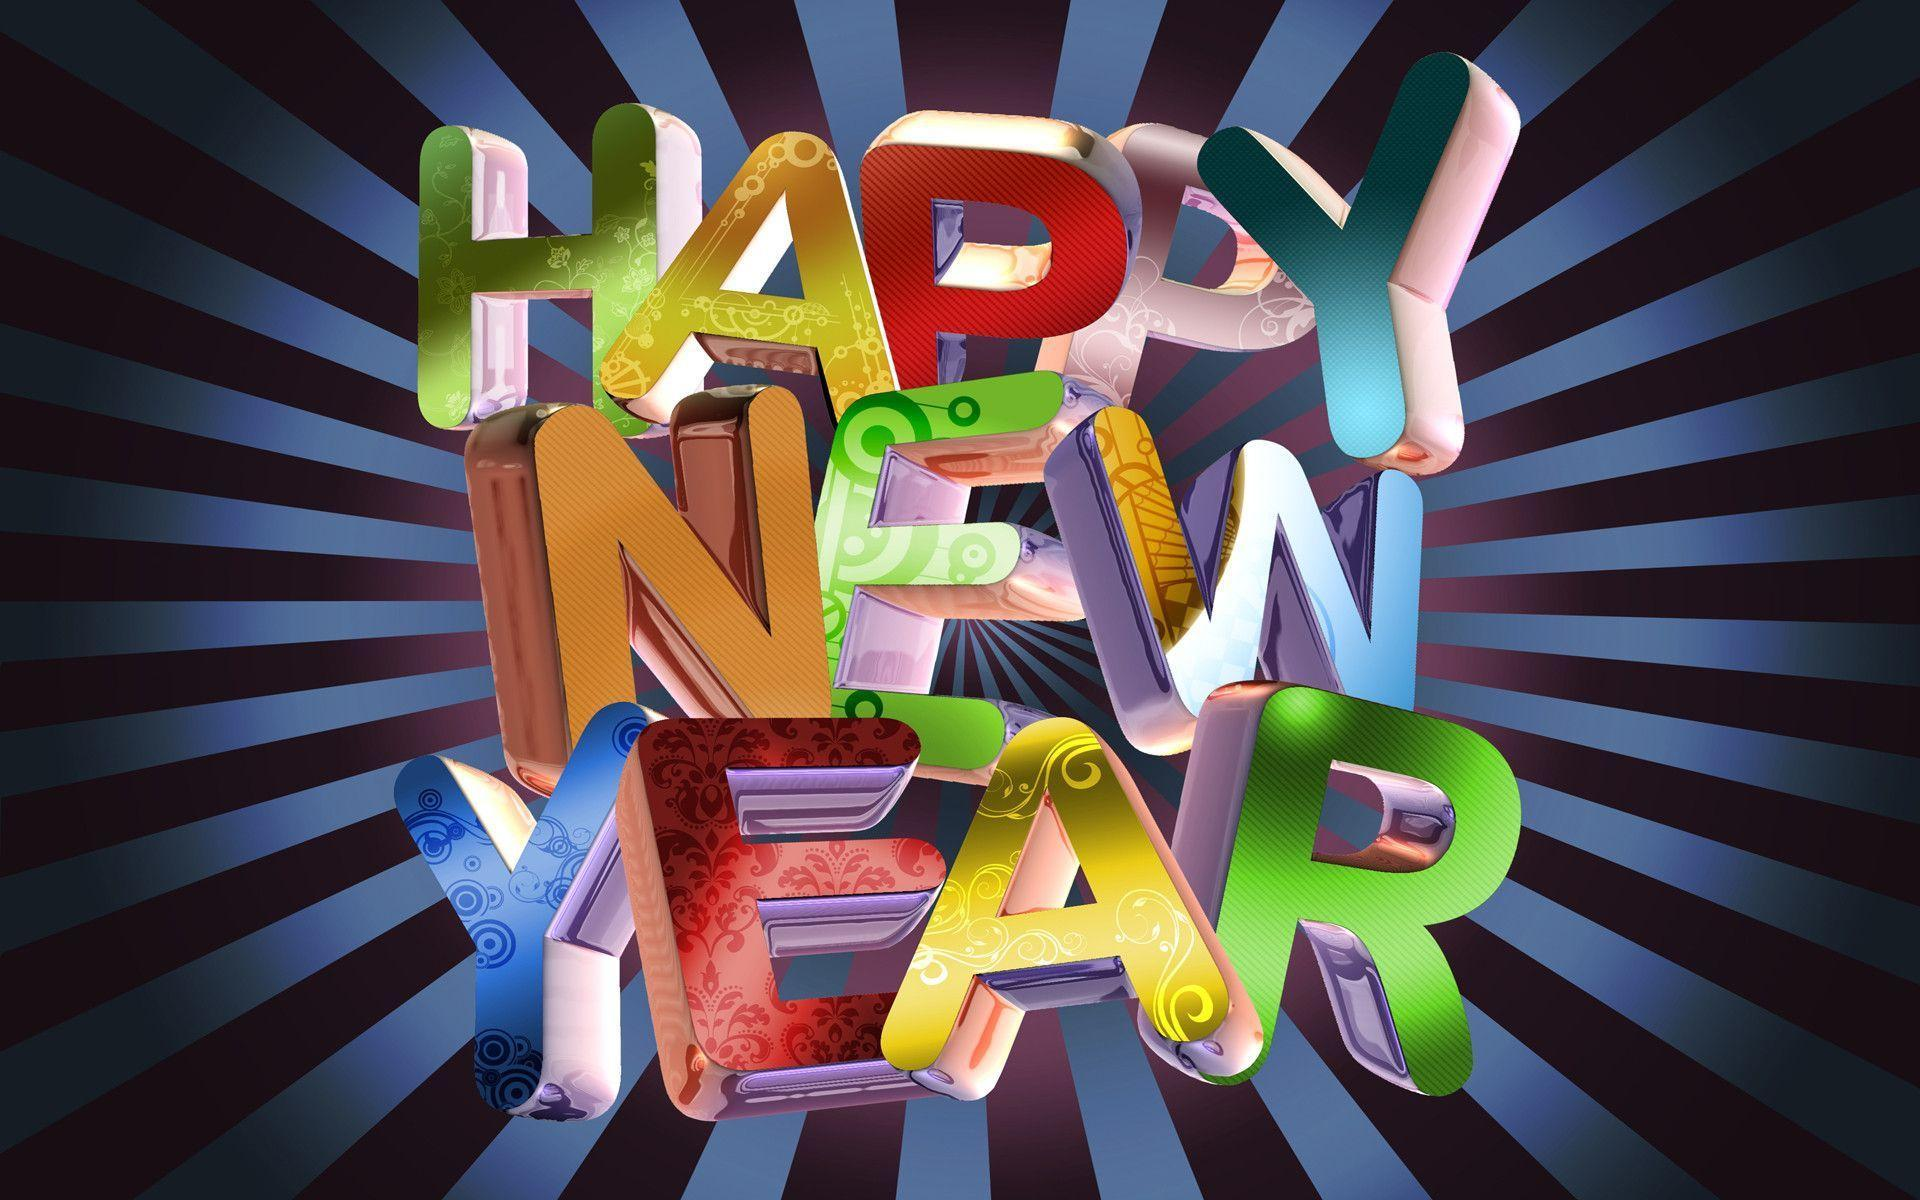 Happy Gujarati New Year